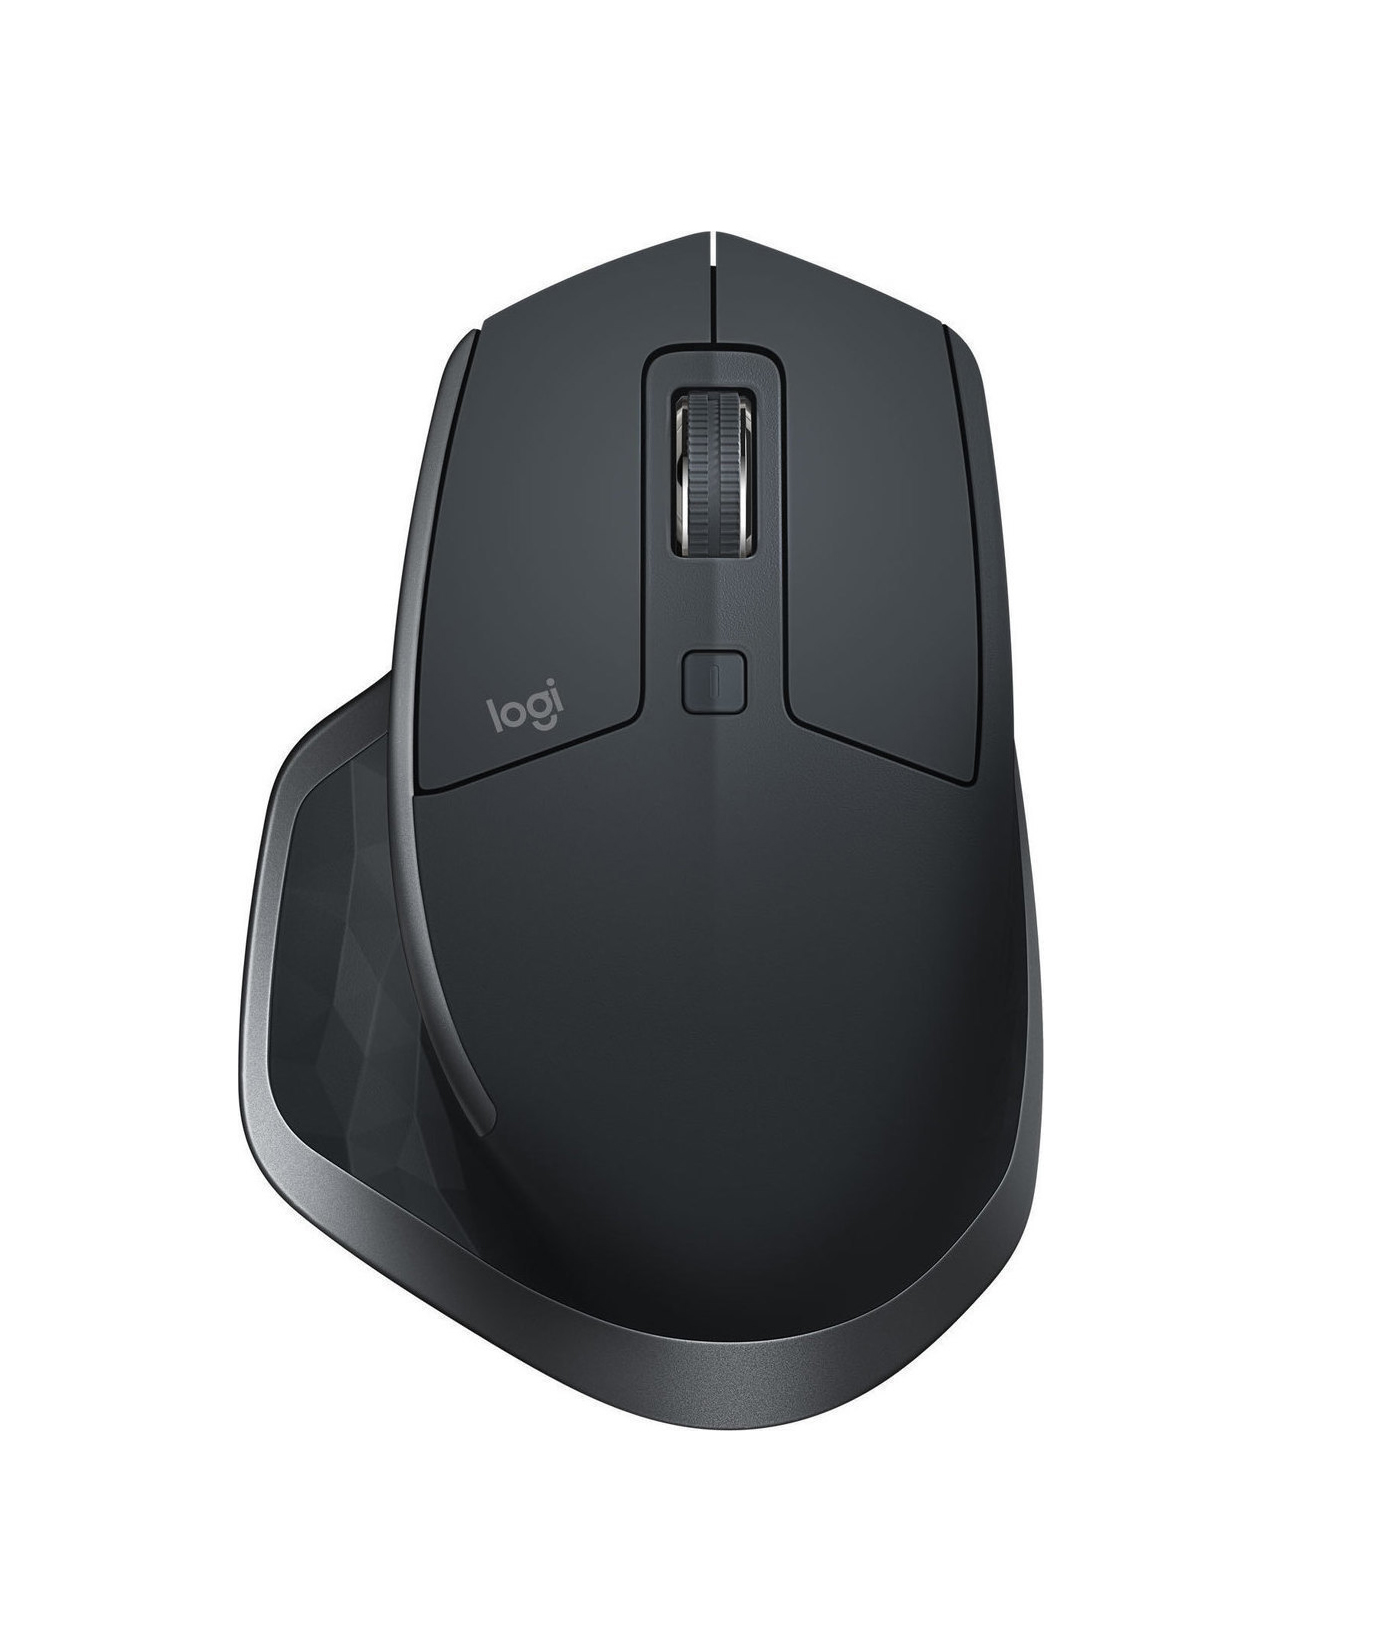 Logitech MX Master 2S Ασύρματο Ποντίκι Graphite